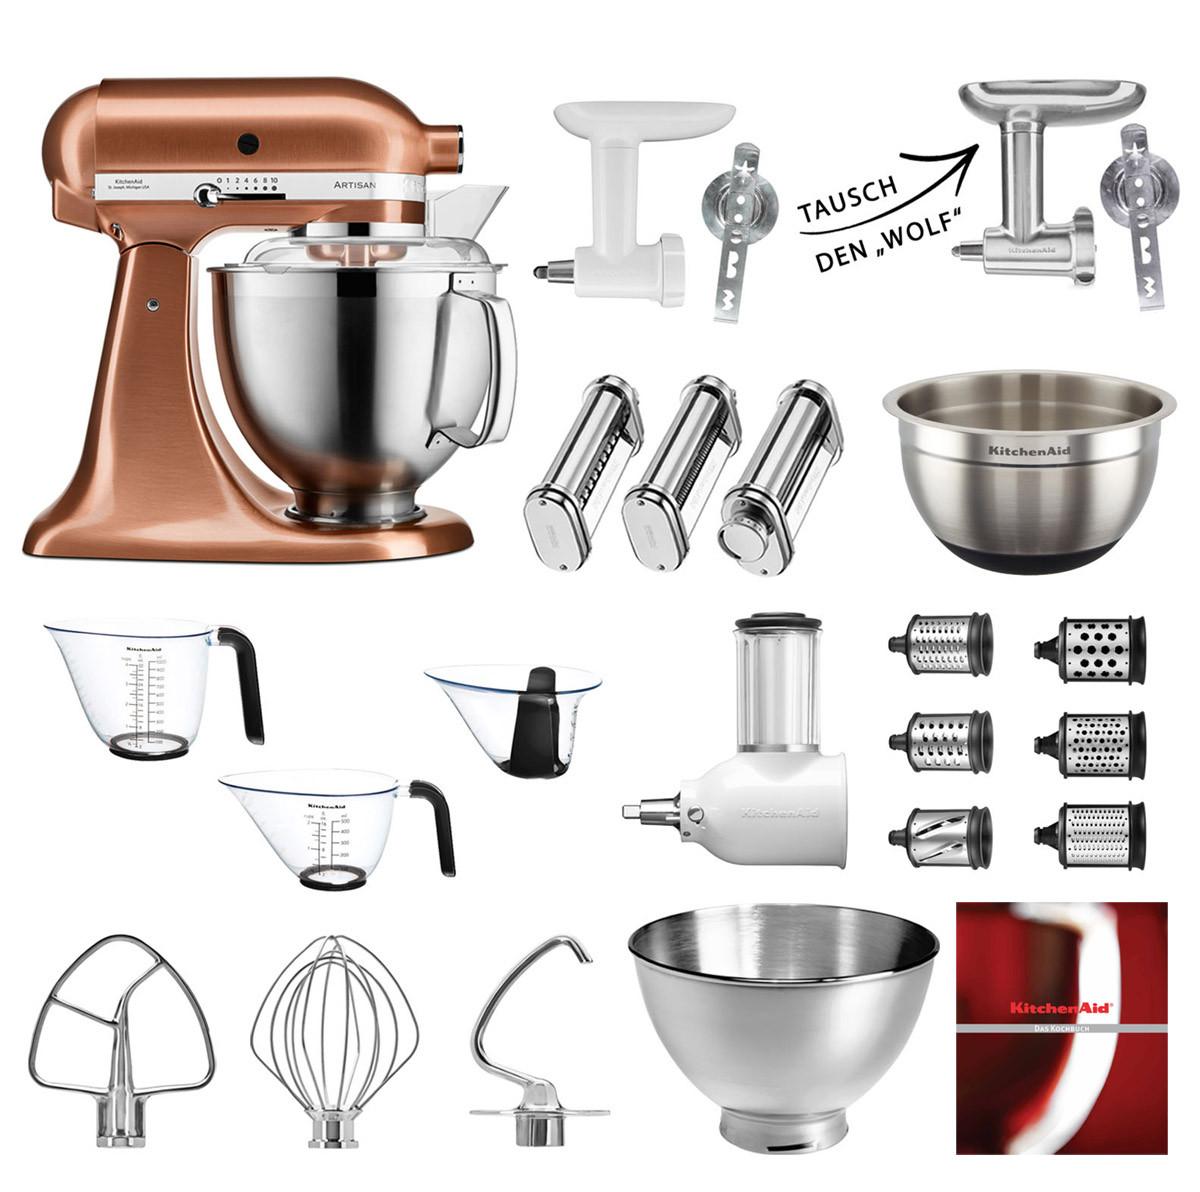 KitchenAid Küchenmaschine 185PS Mega-Paket Premium Edition